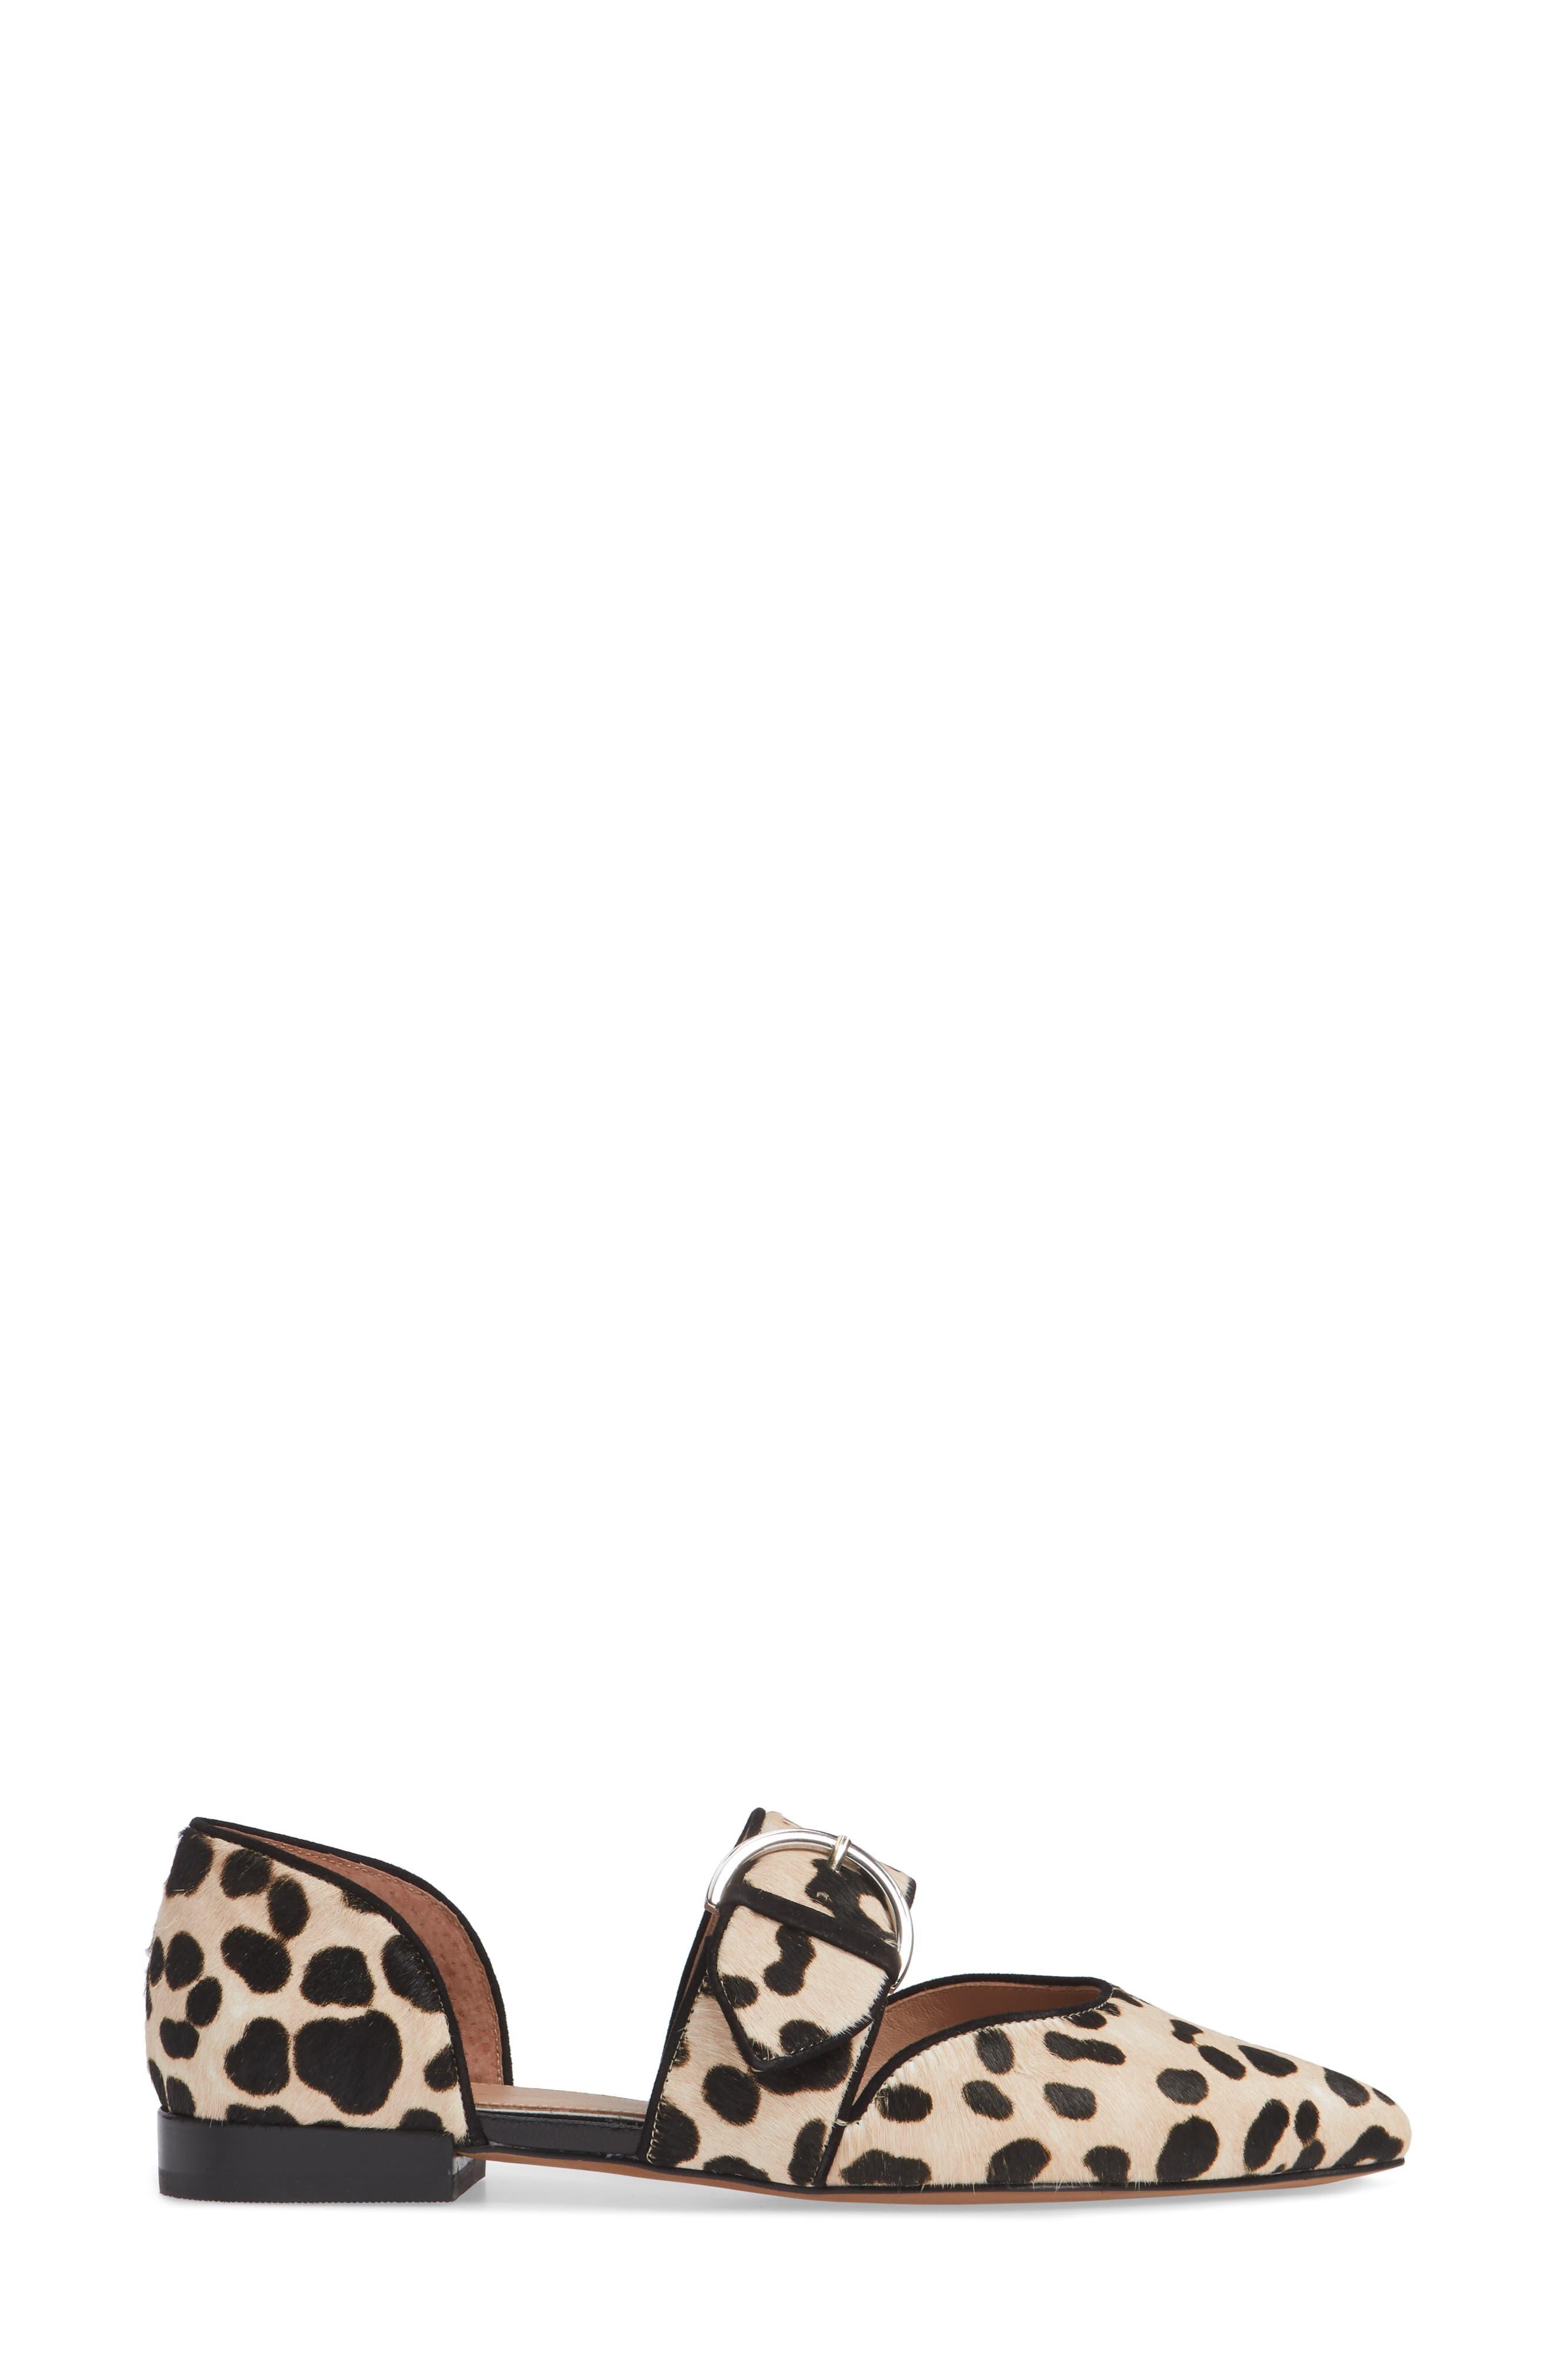 Dean Pointy Toe Flat,                             Alternate thumbnail 3, color,                             WHITE/ BLACK PRINT HAIRCALF